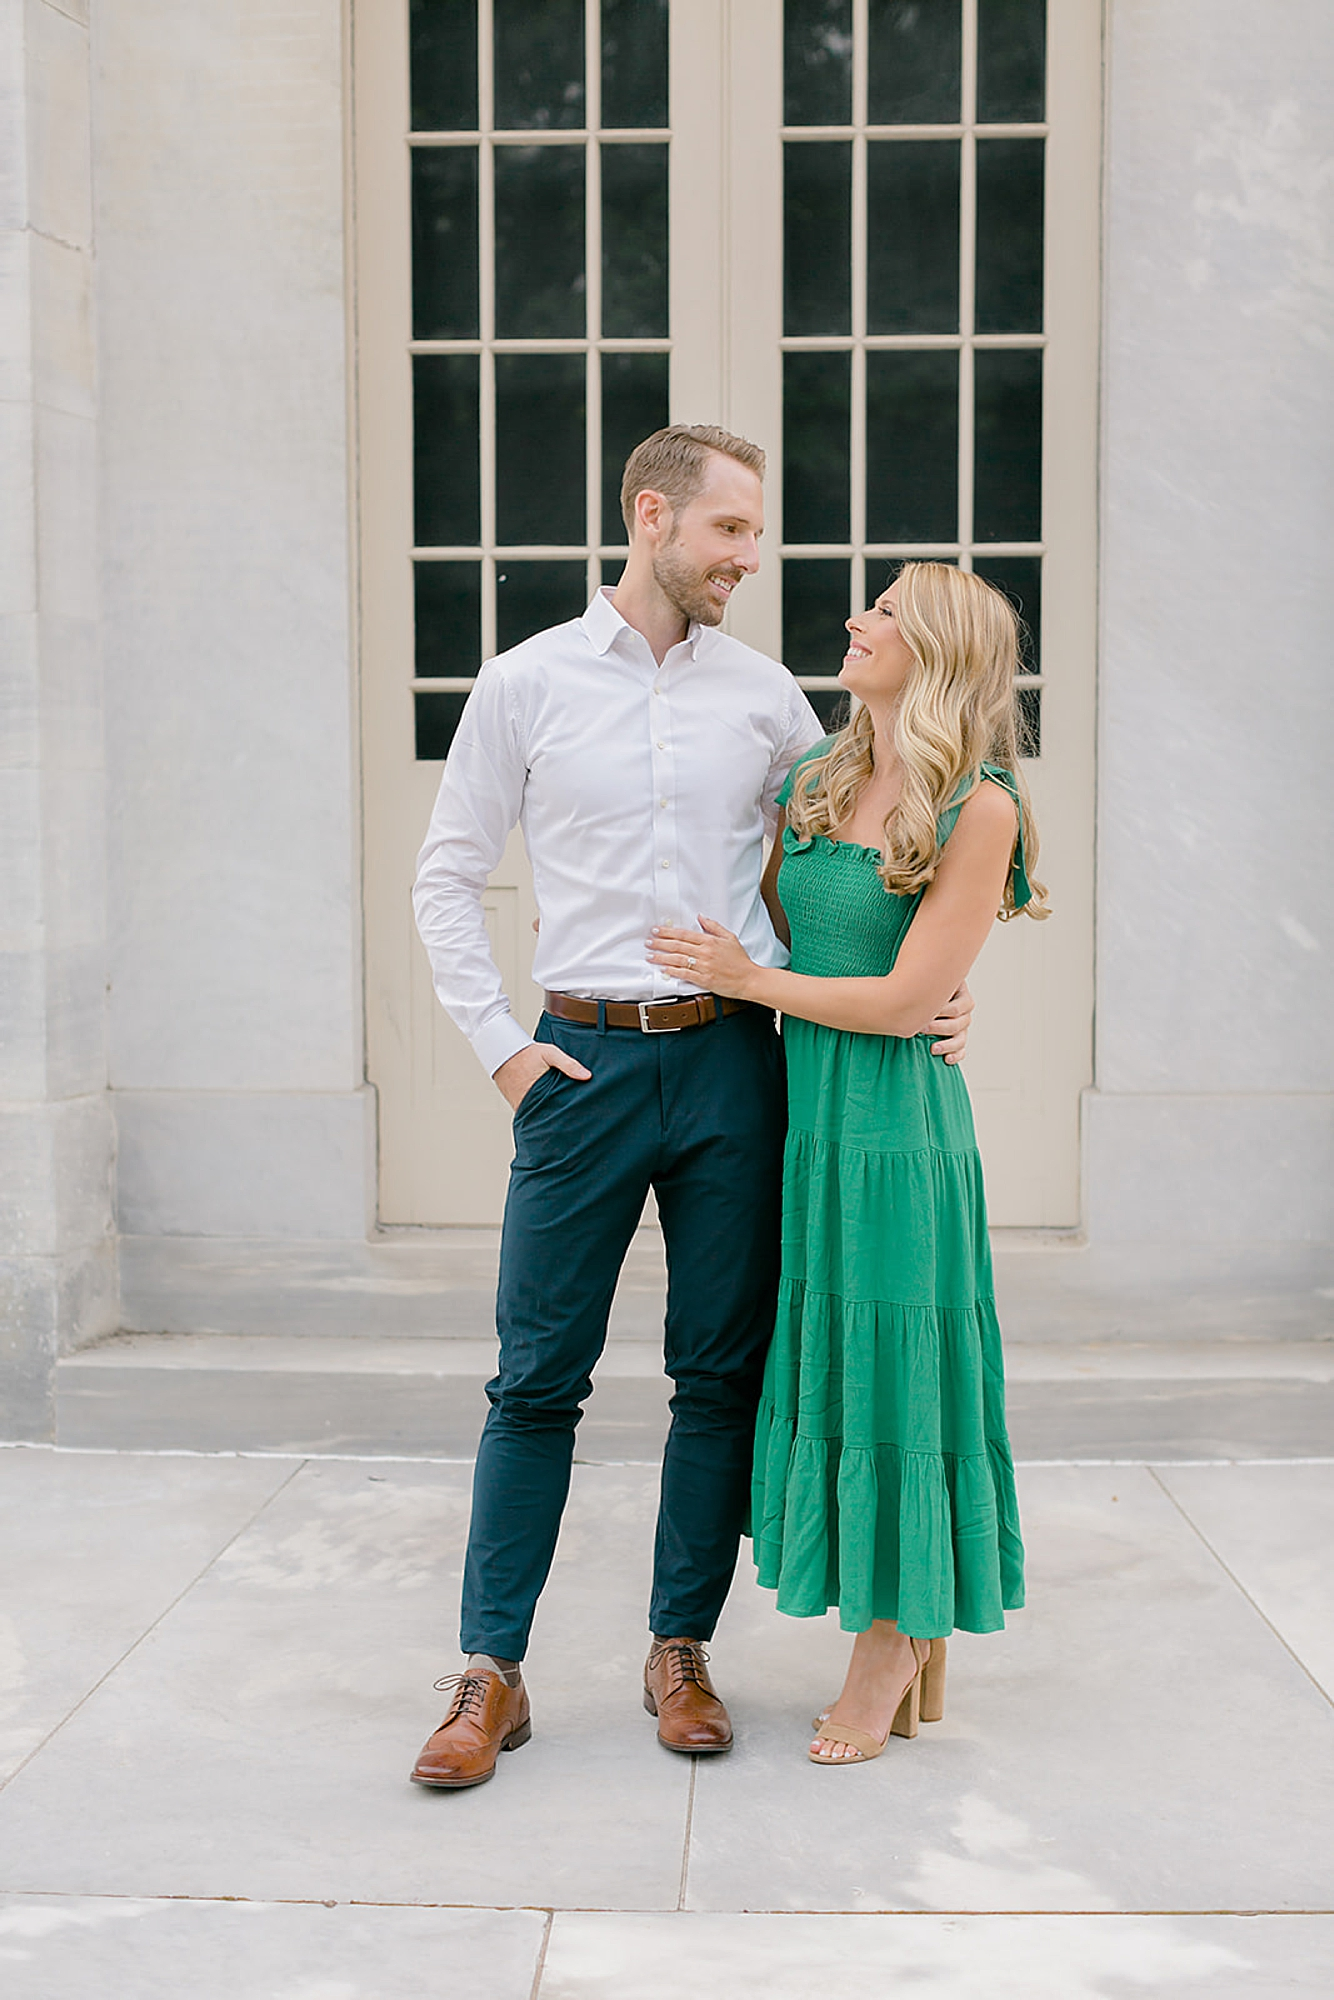 Philadelphia Engagement Photography by Magdalena Studios 0002